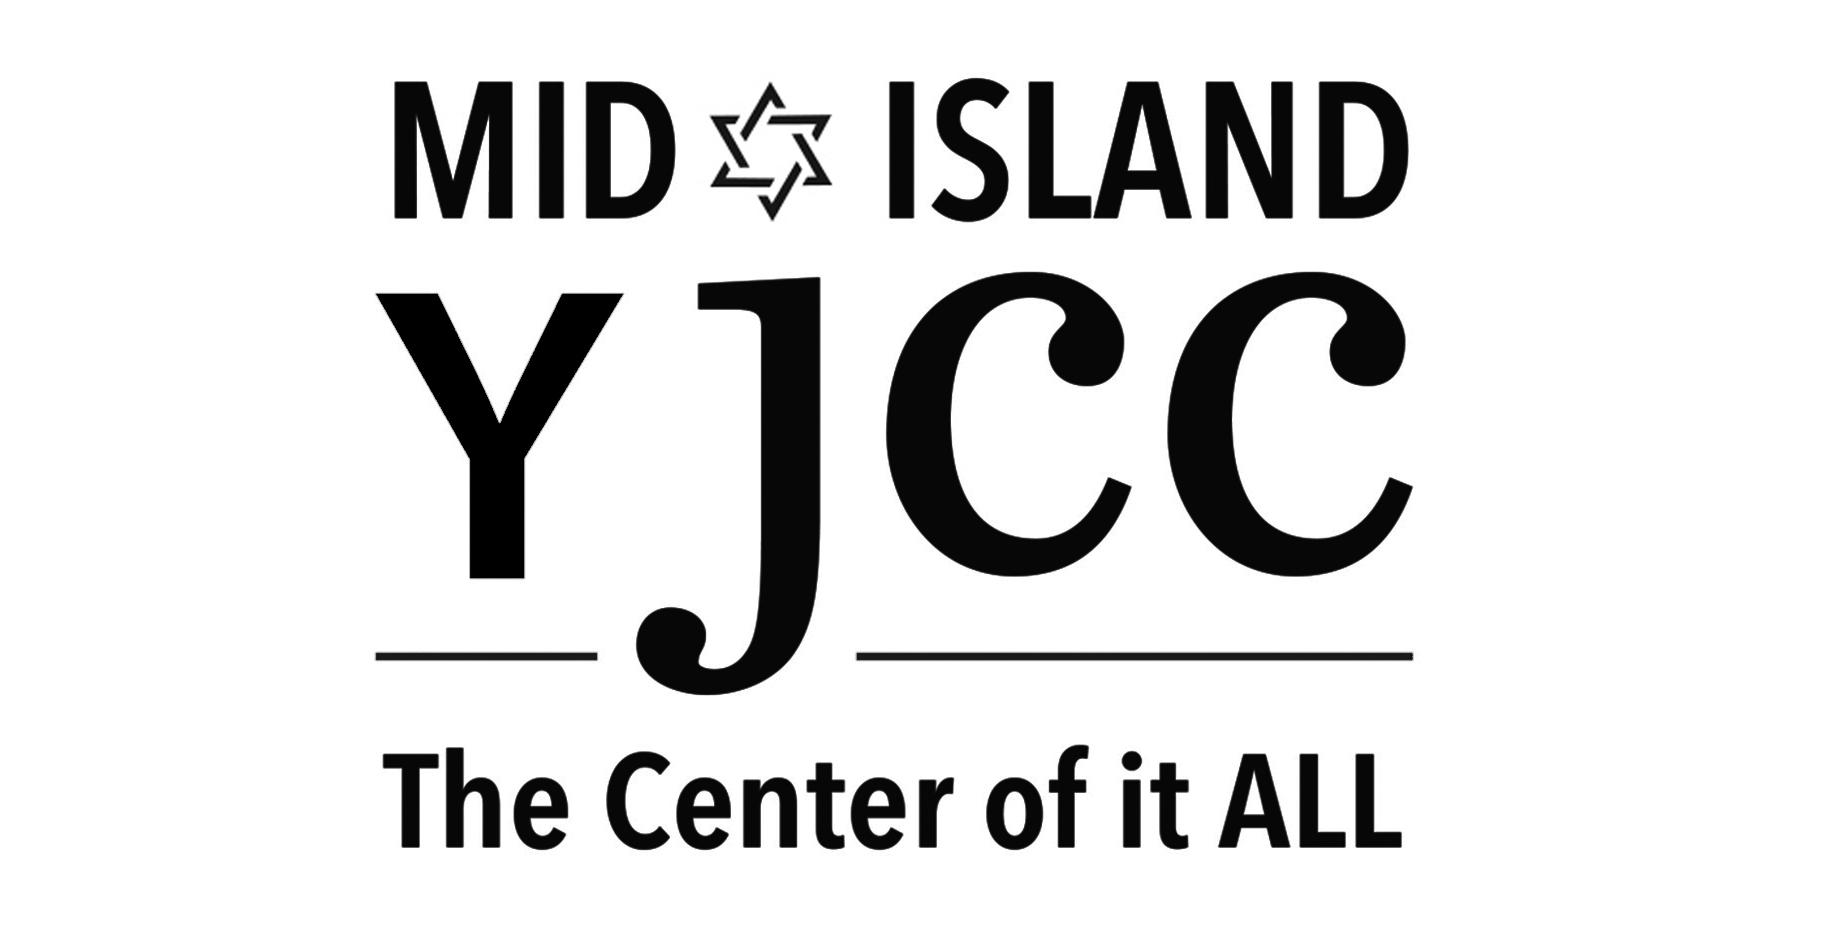 www.miyjcc.org